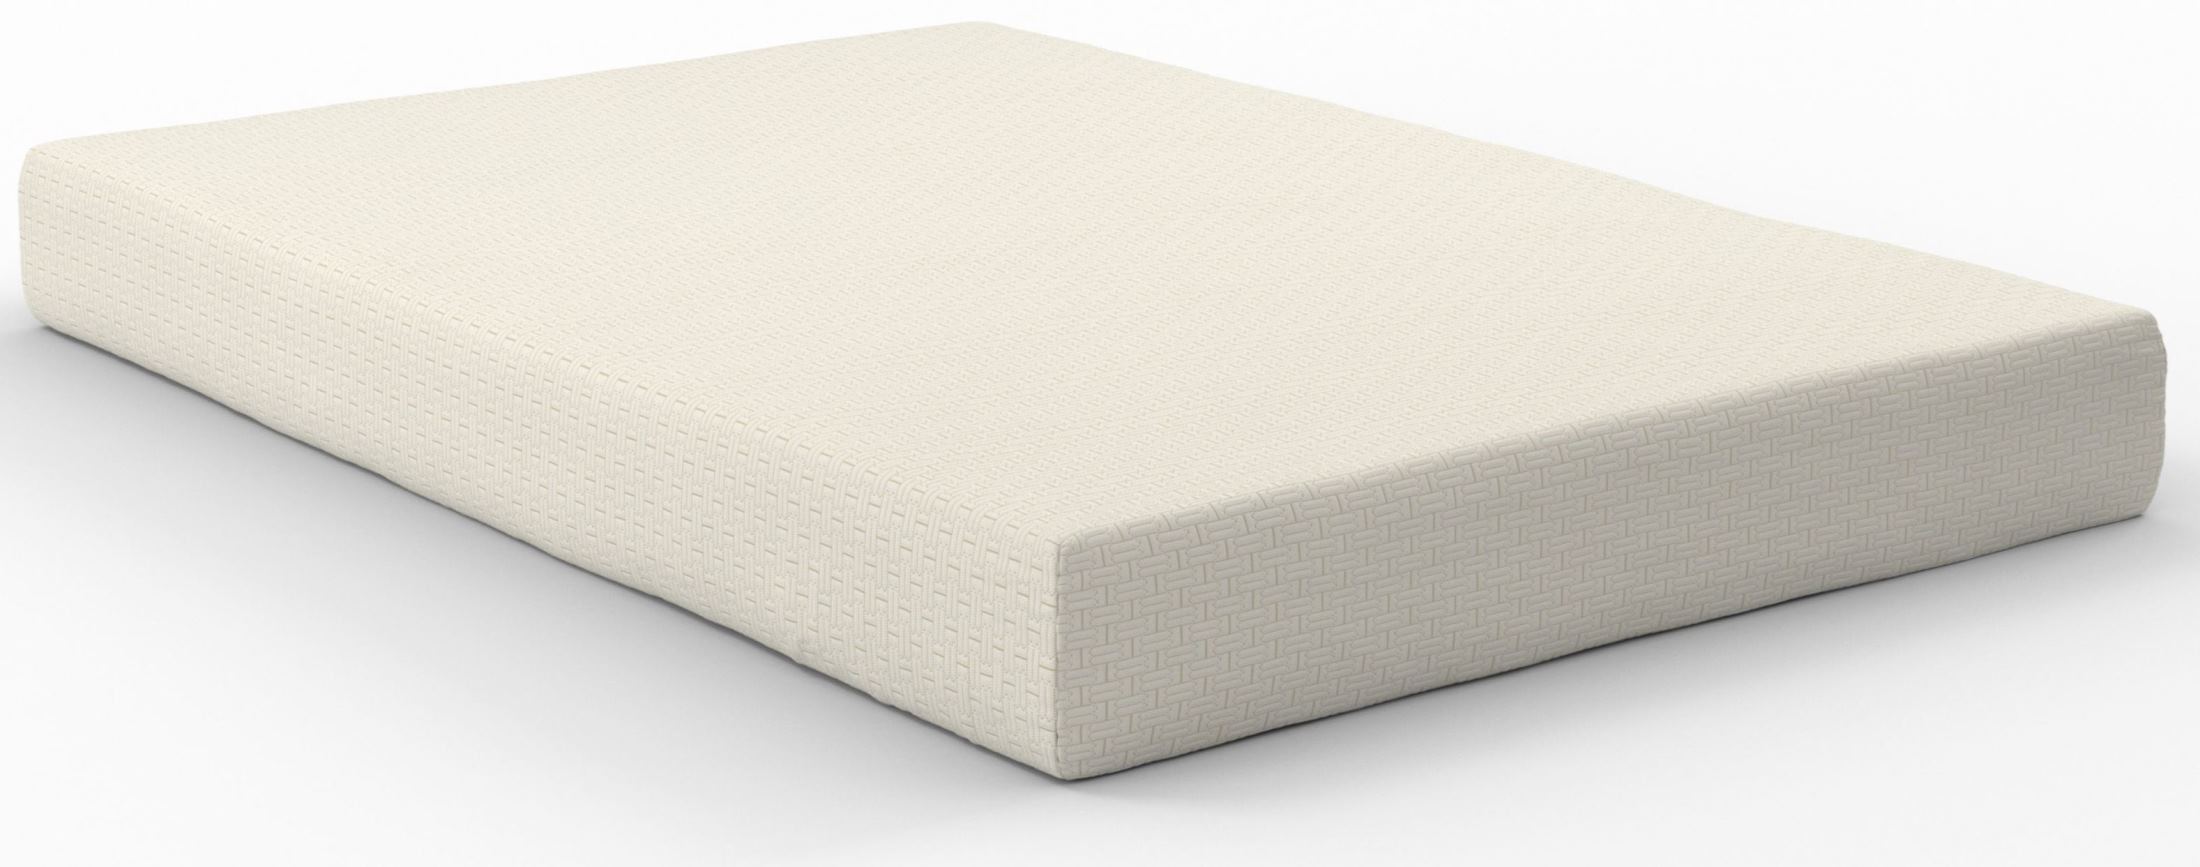 8 Inch Foam Mattress White Twin Mattress From Ashley Coleman Furniture